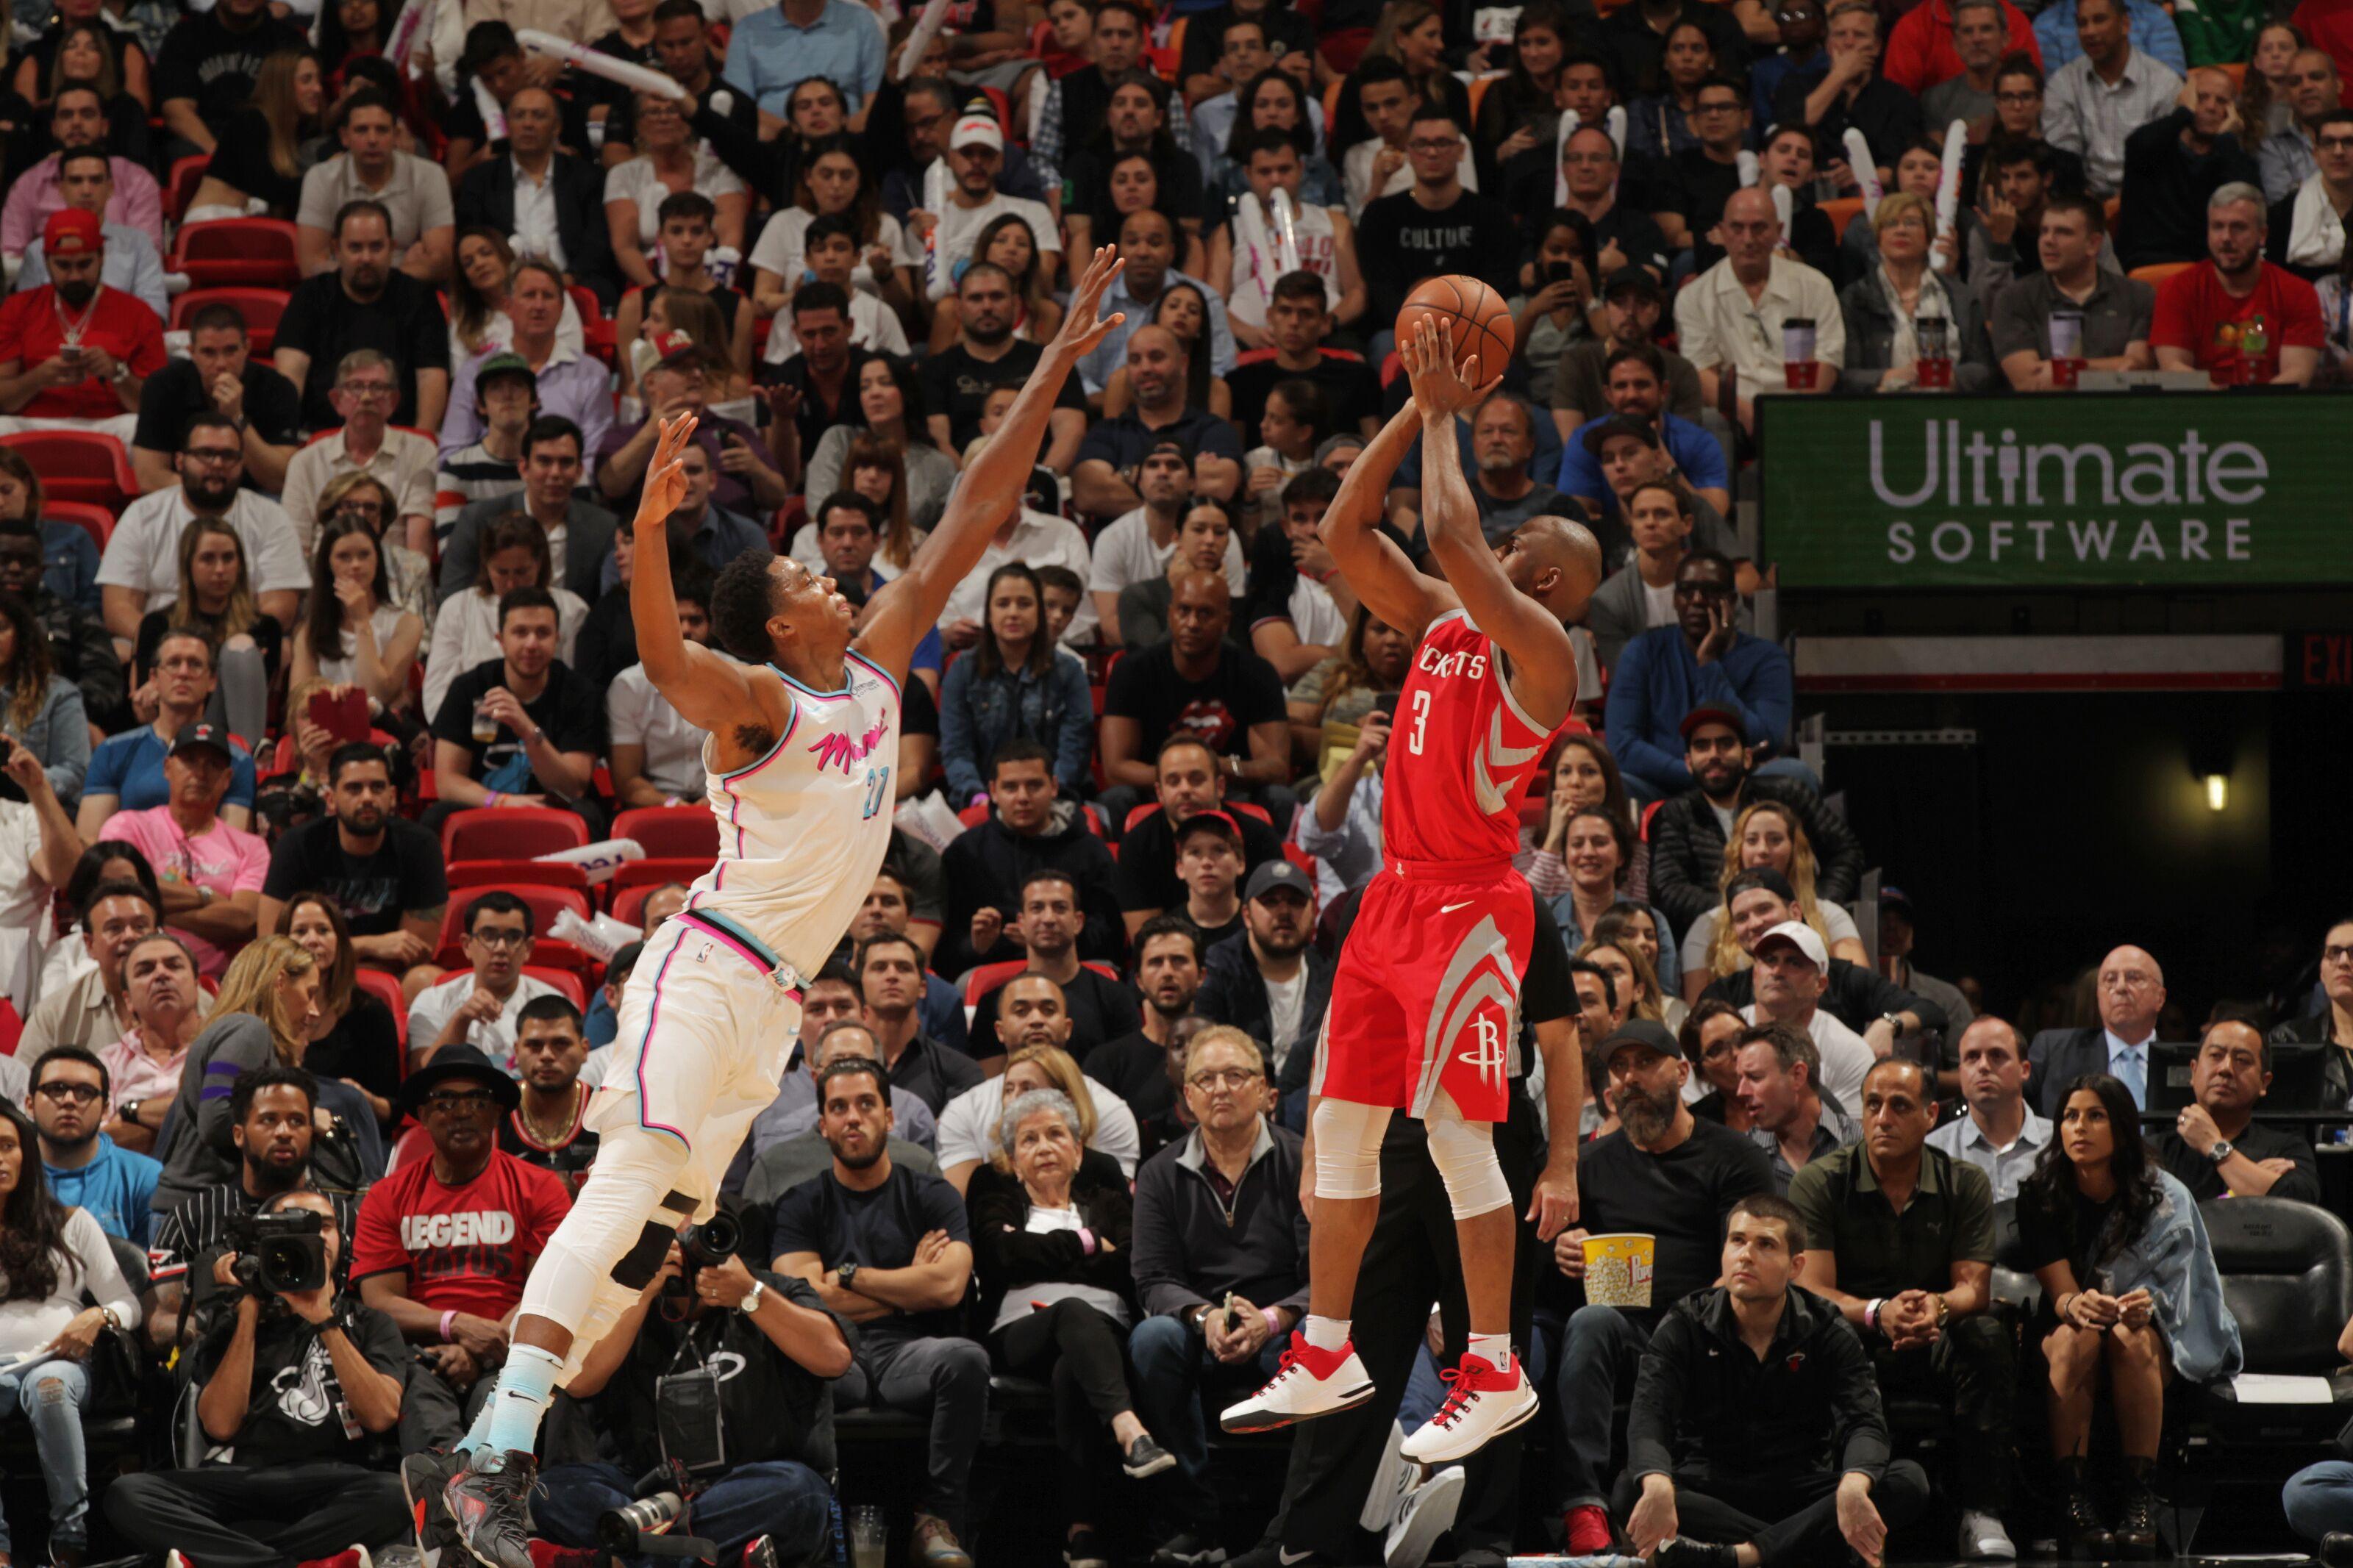 Miami Heat Hot Topics: Grading Hassan, trading for Chris Paul?